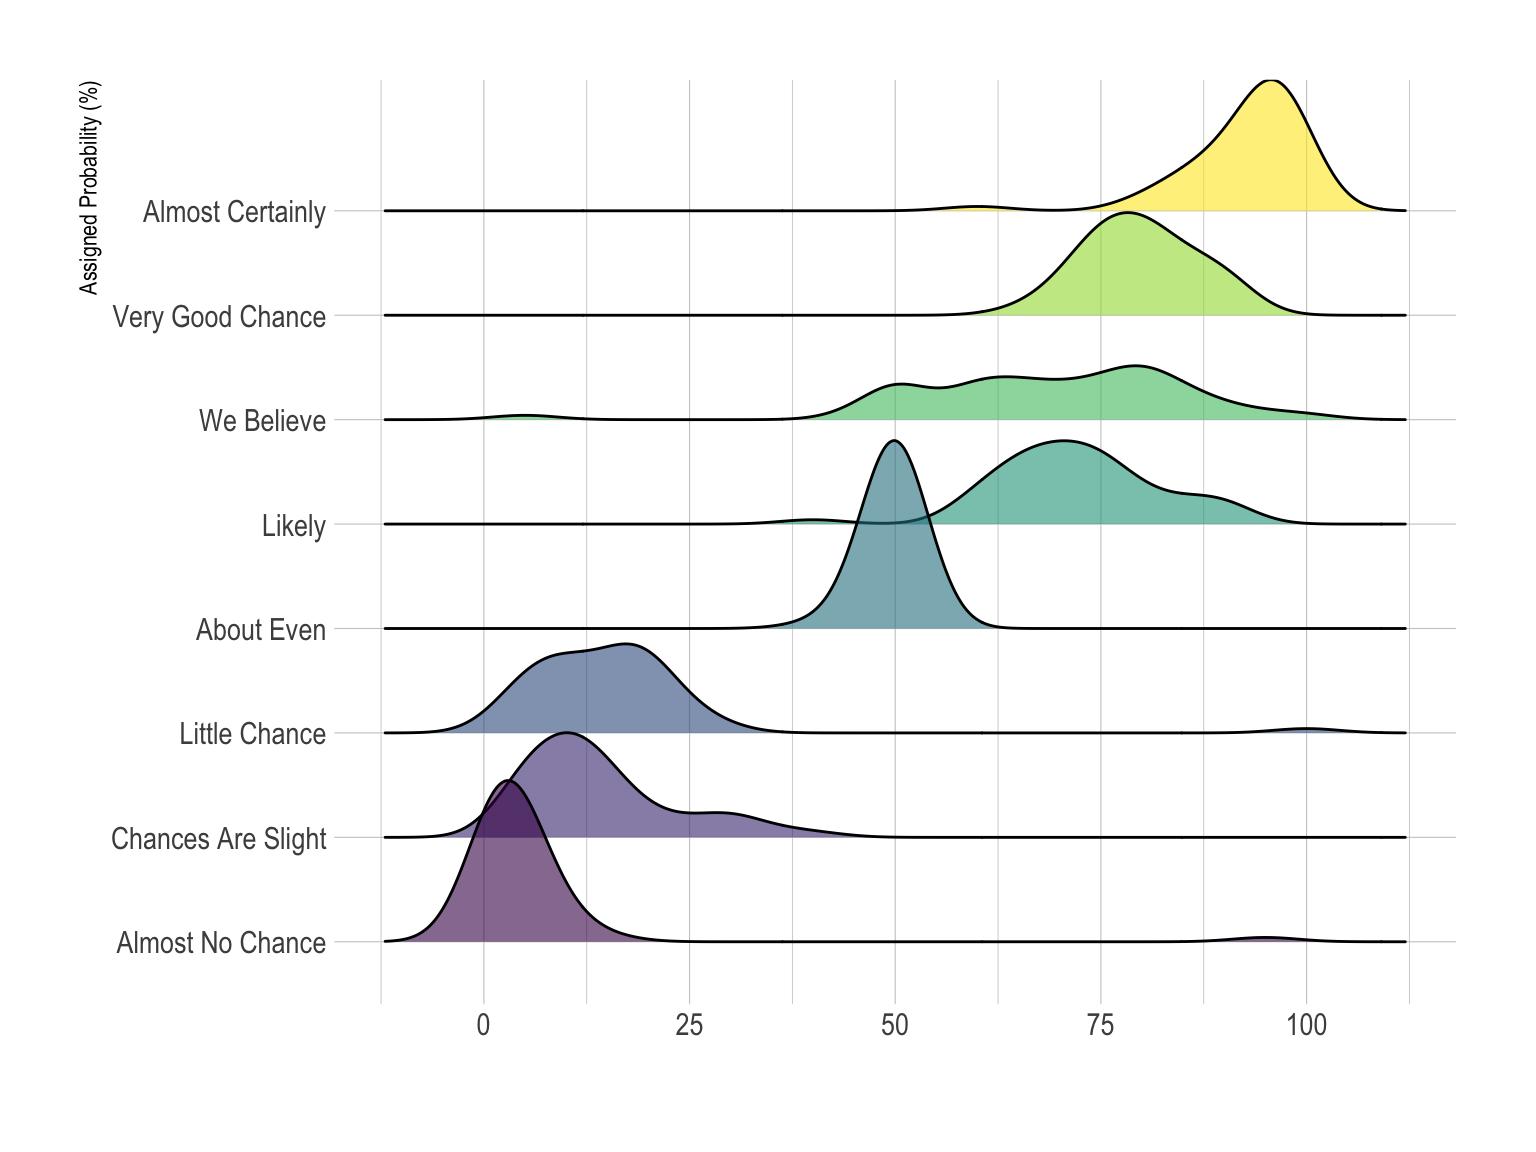 Ridgeline plot – from Data to Viz